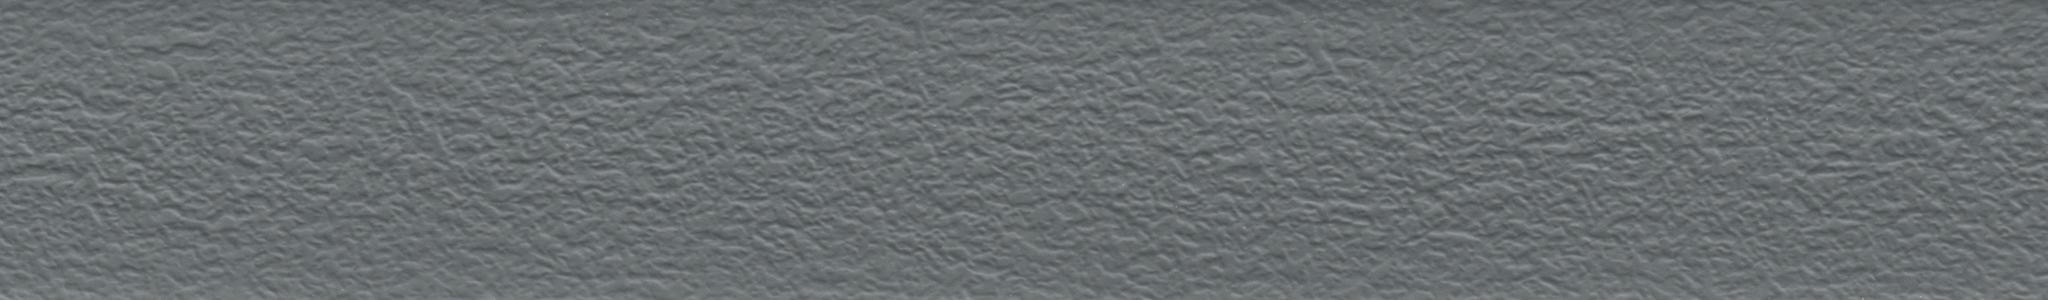 HU 170077 ABS hrana šedá tmavá perla XA